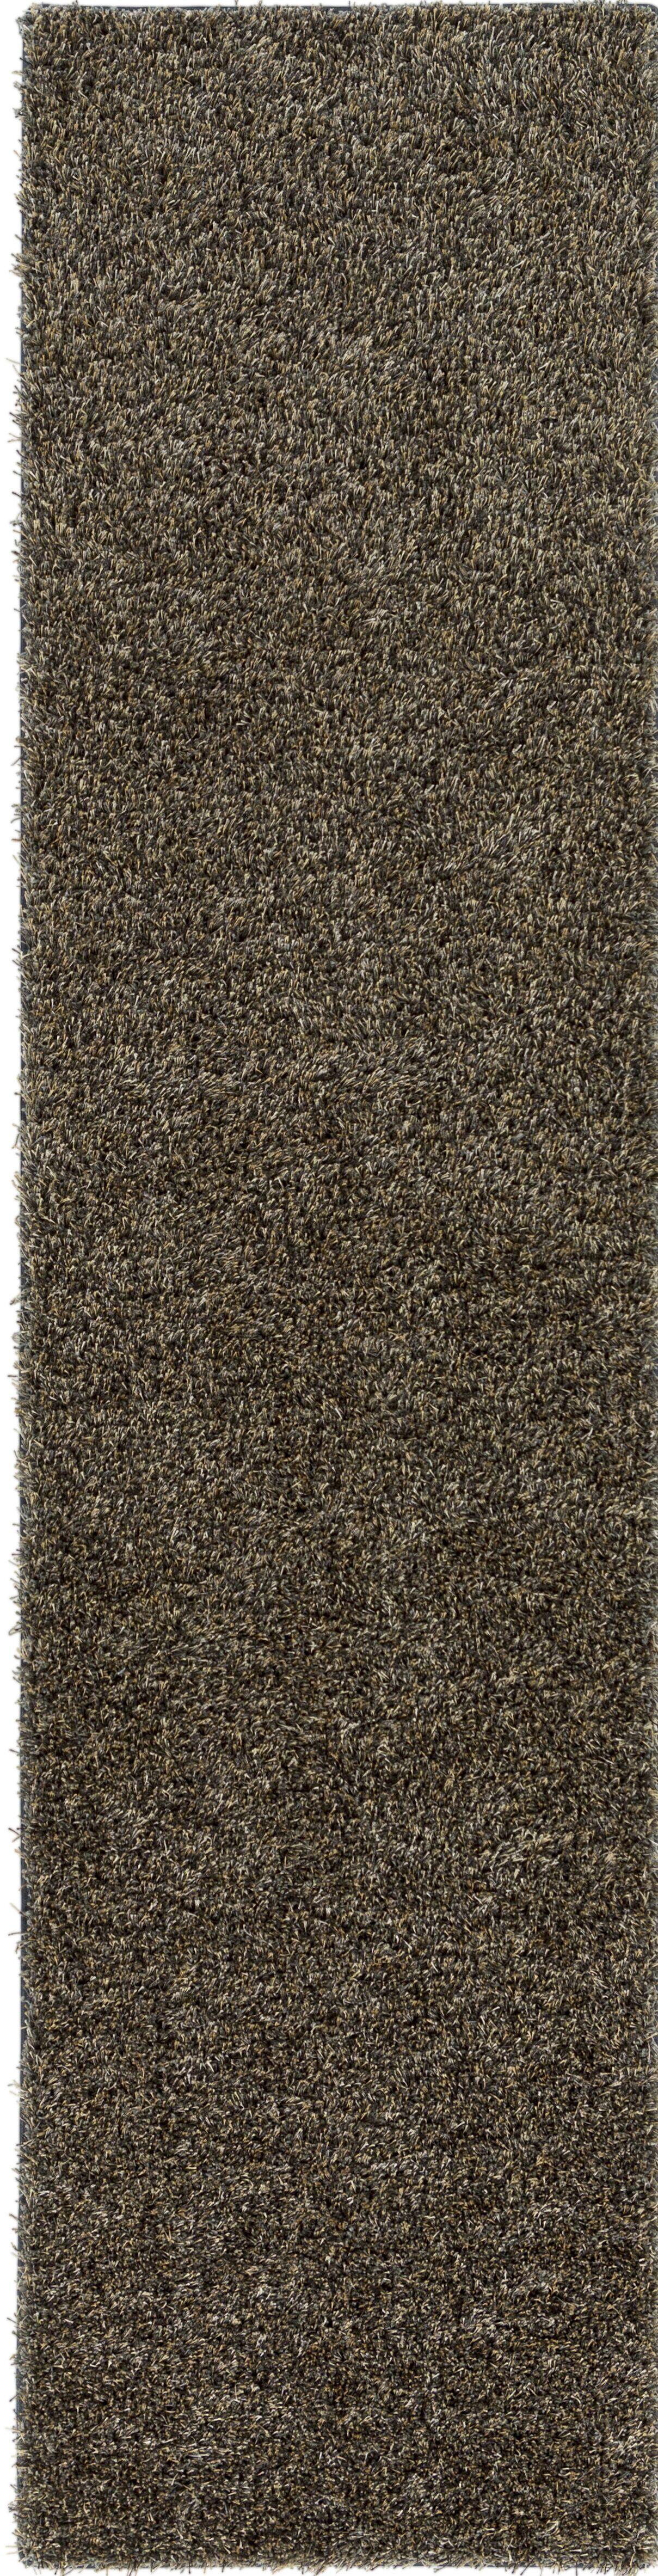 Dulcia Gray Area Rug Rug Size: Runner 2' x 10'